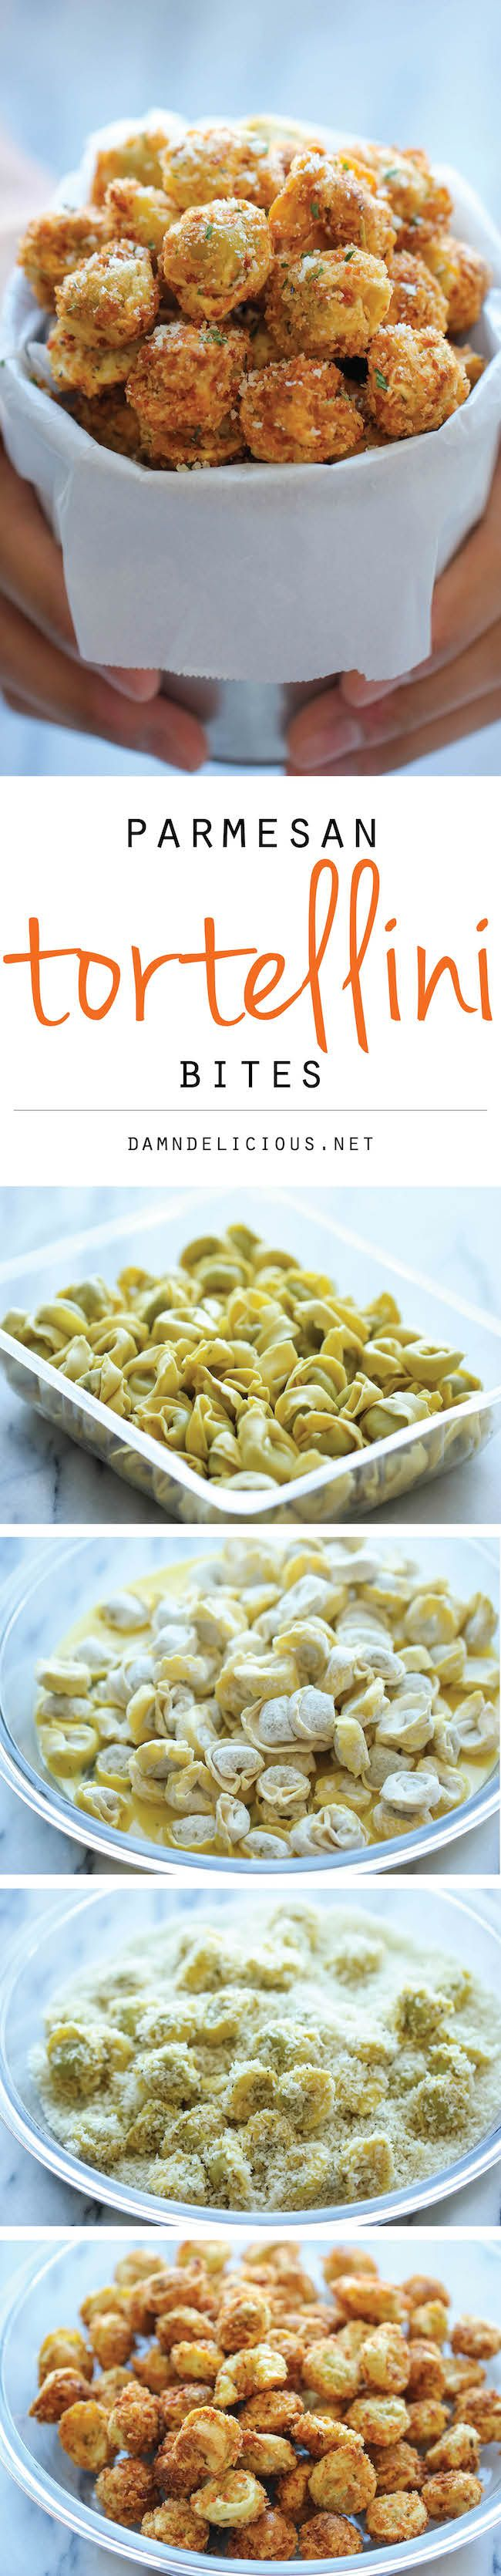 Parmesan Tortellini Bites - Damn Delicious